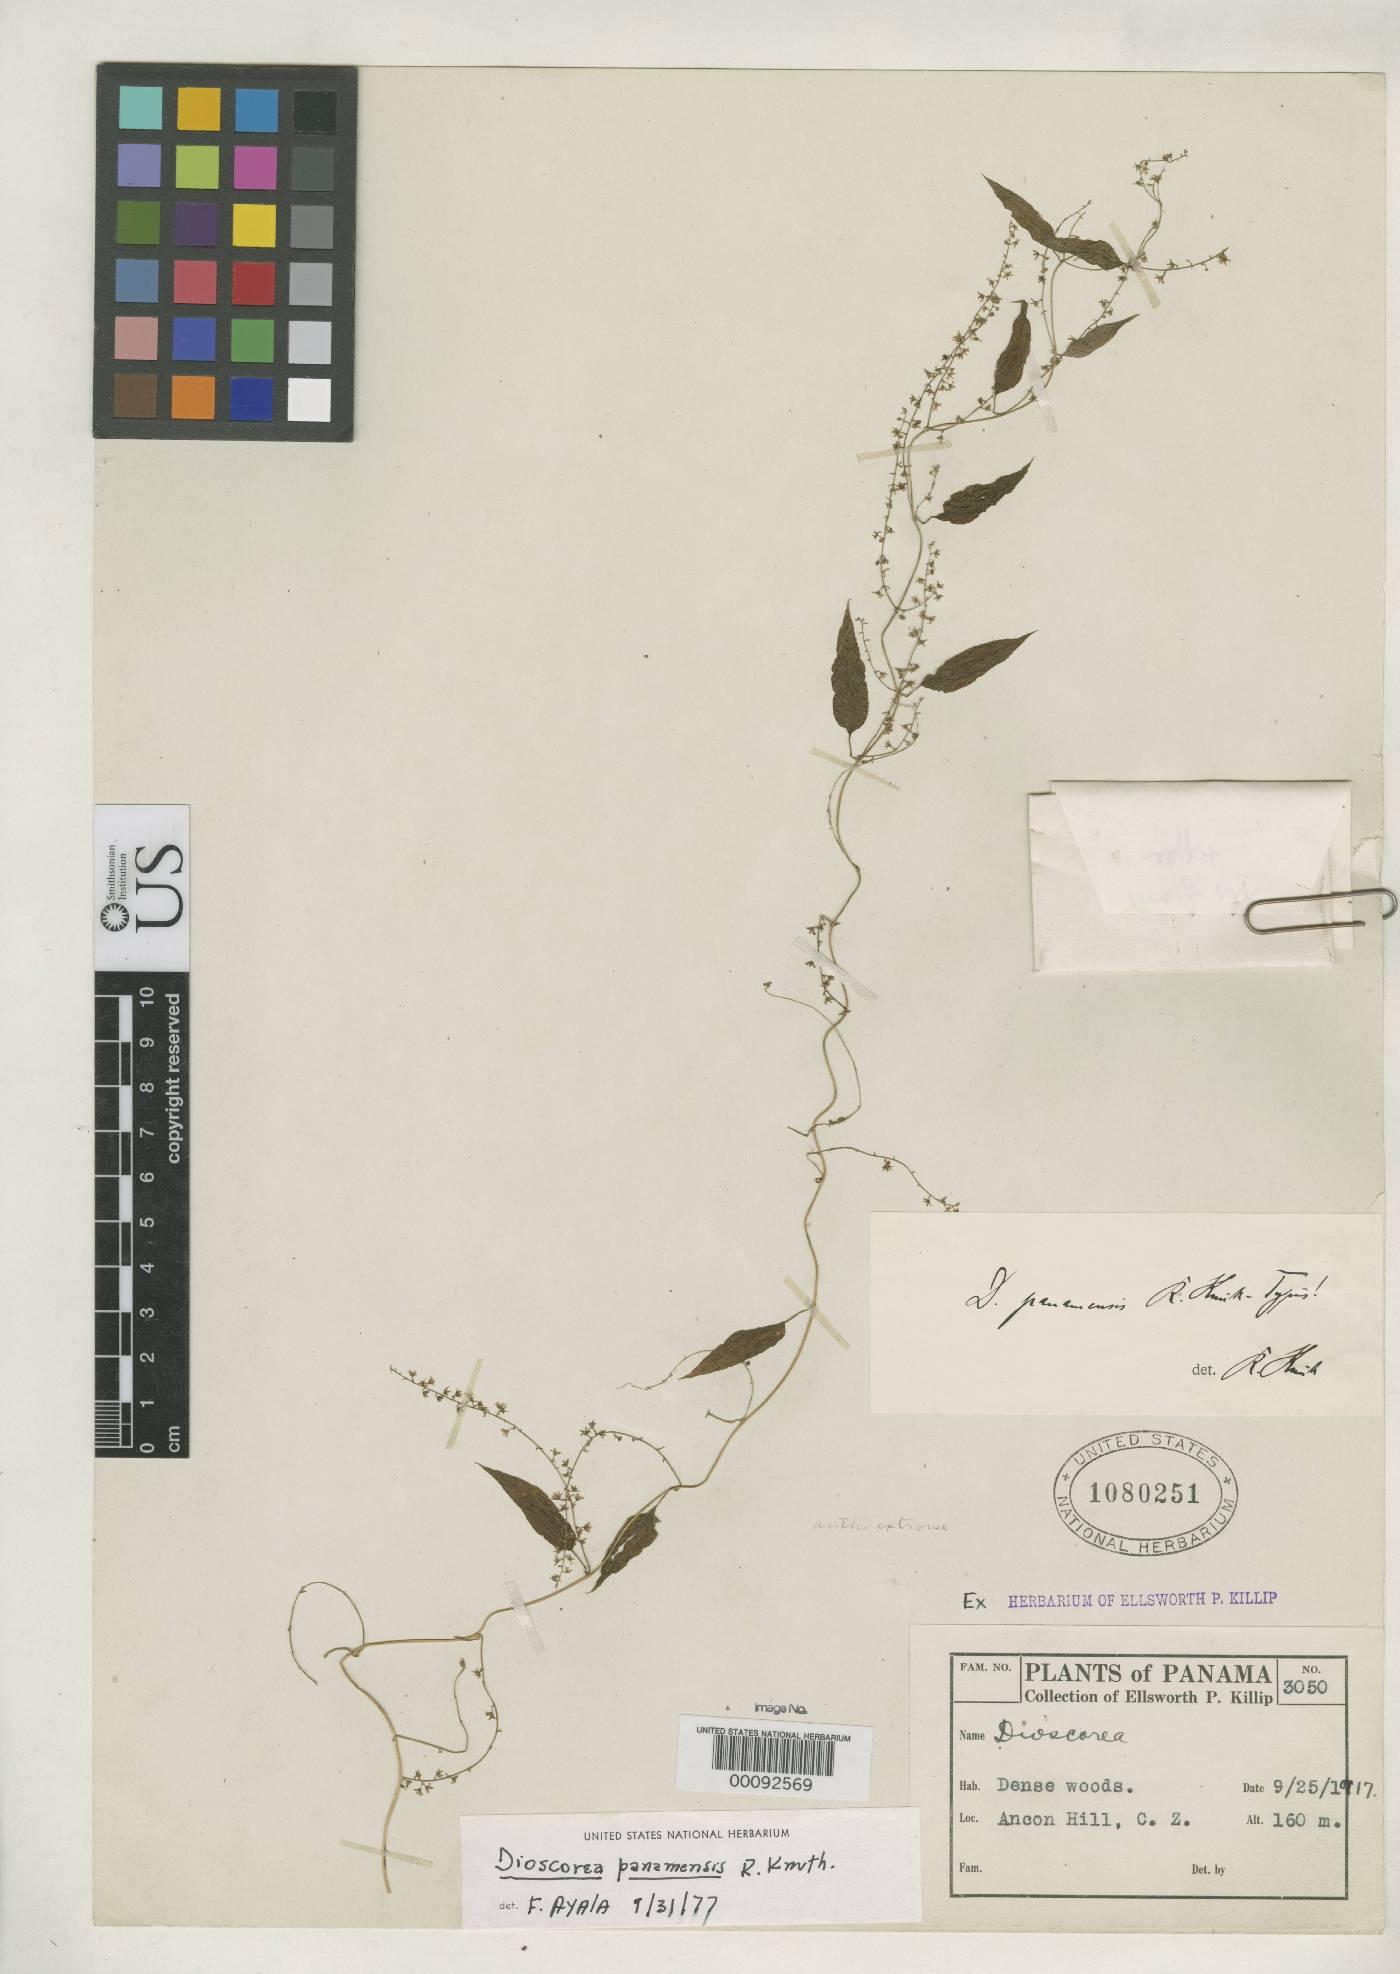 Dioscorea panamensis image